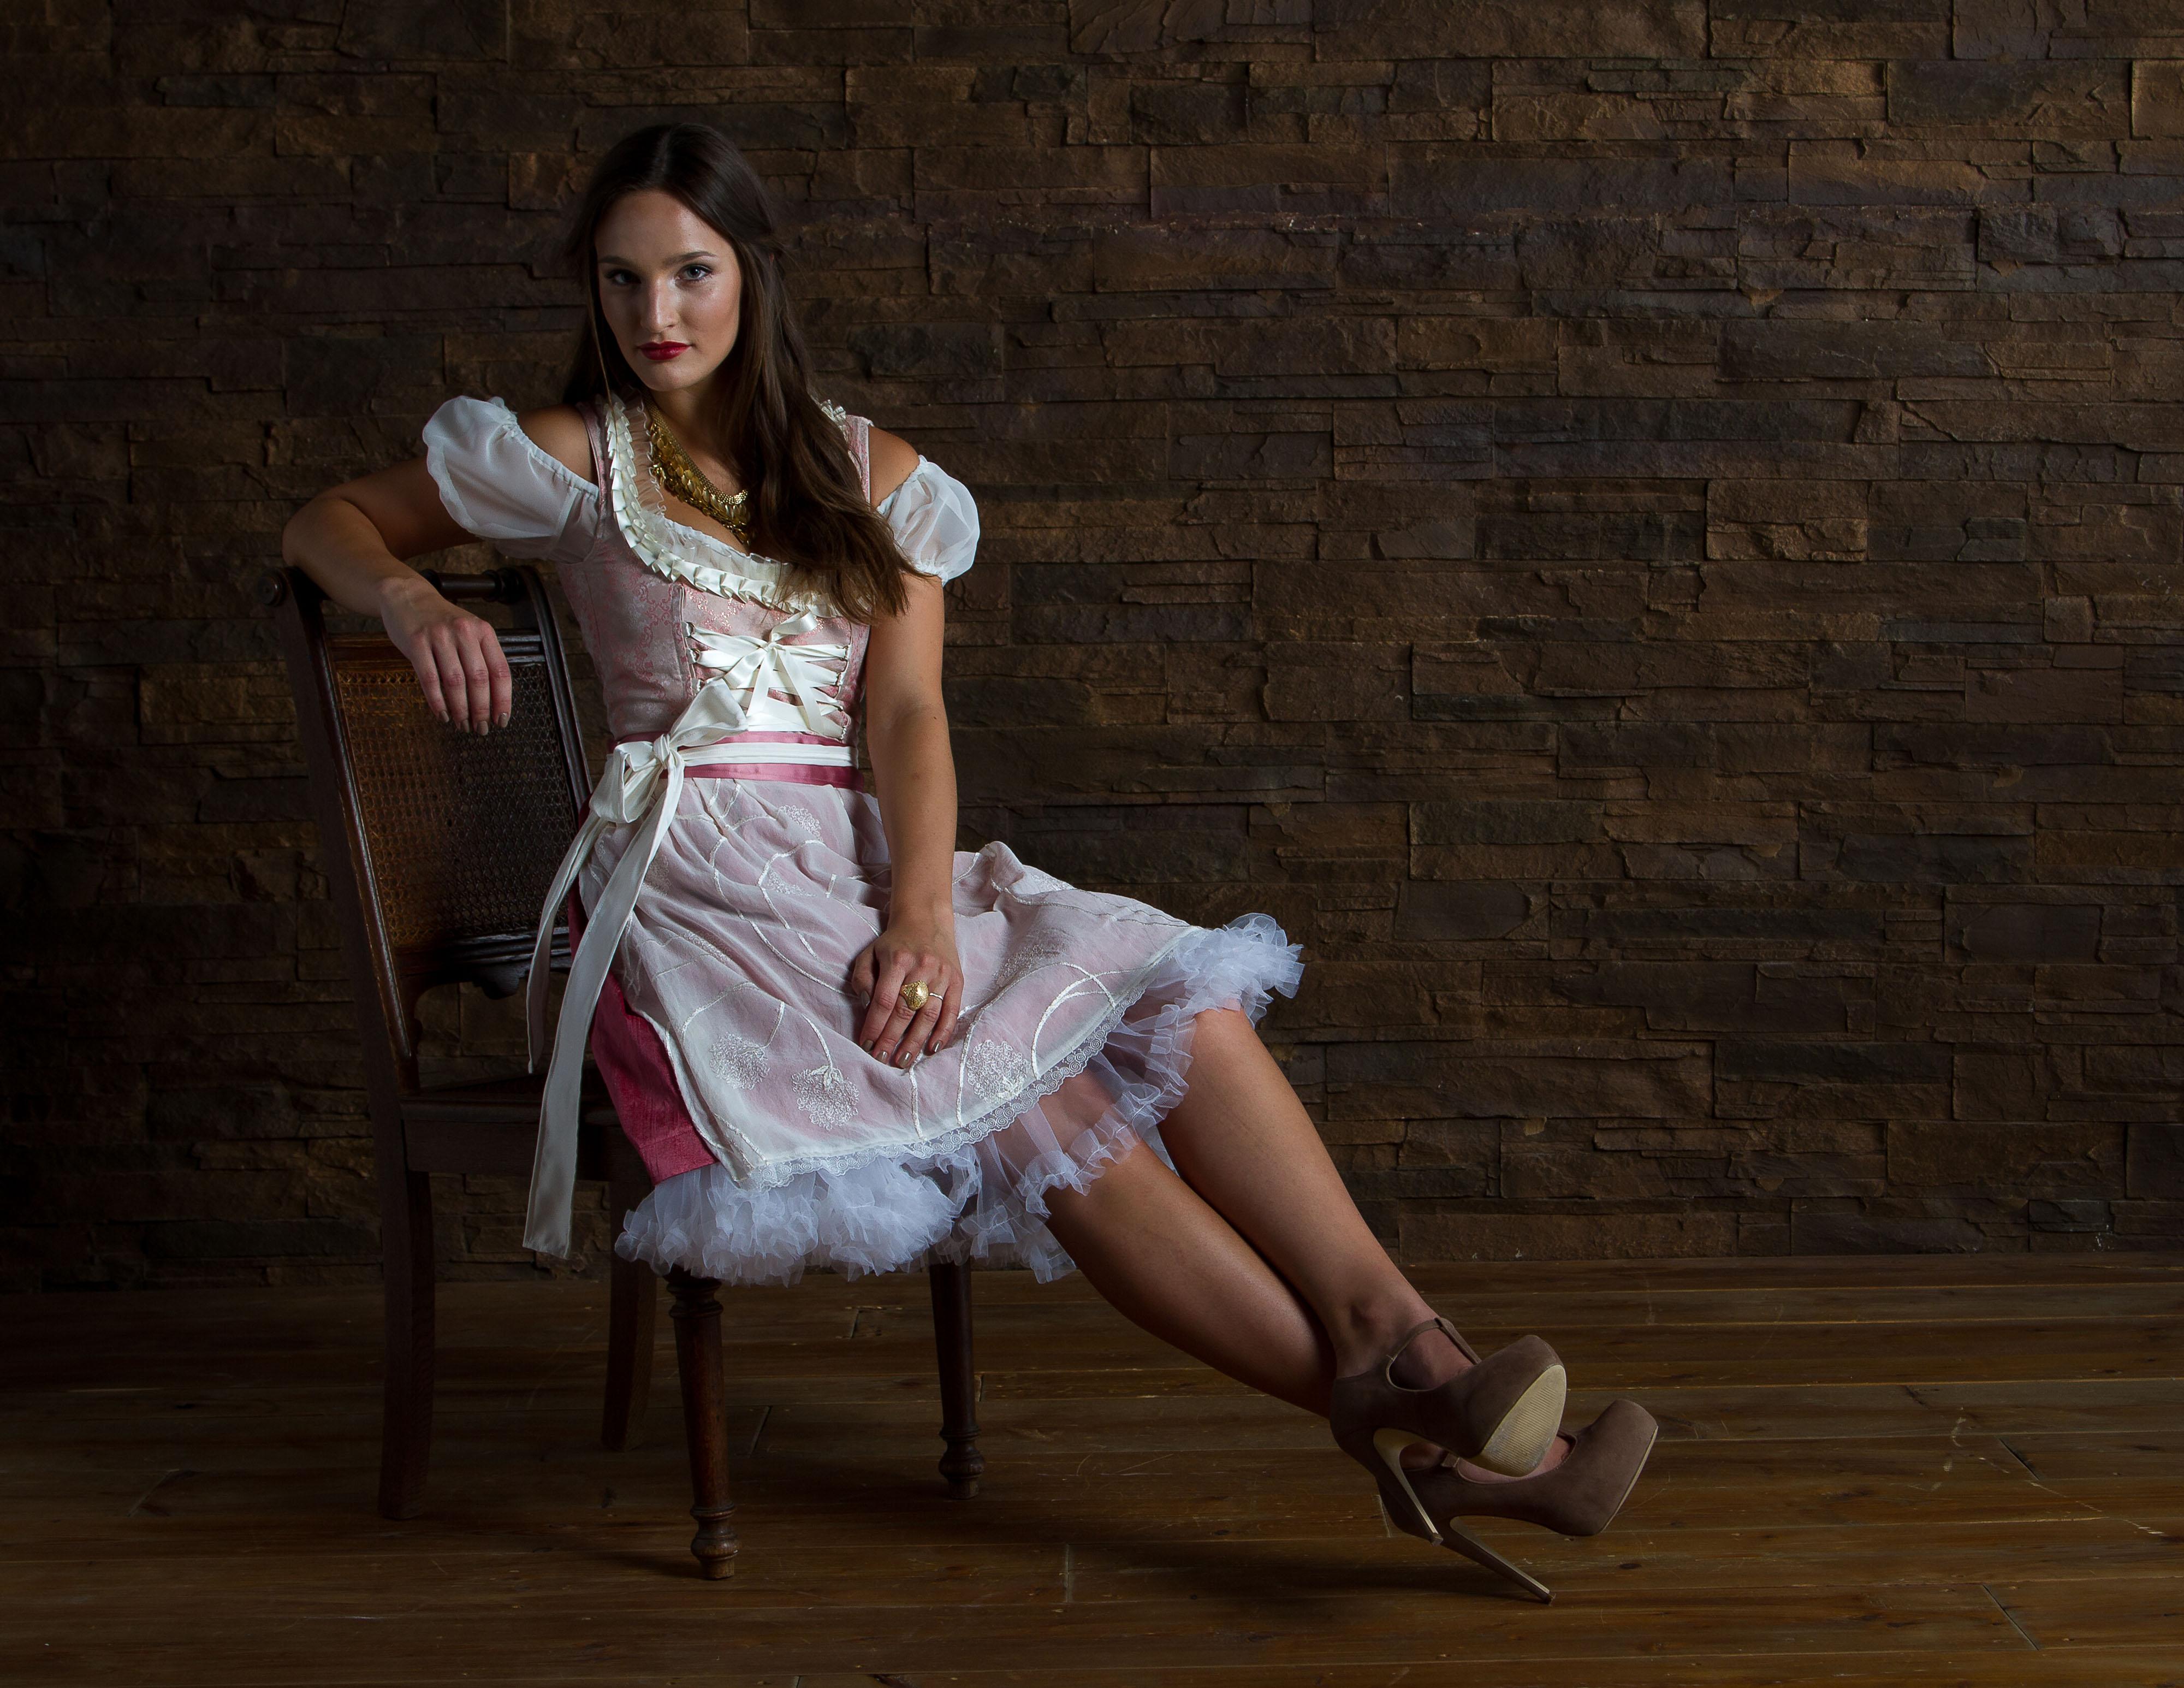 Fotograf:: Brian Cann Model: Alicia Molle